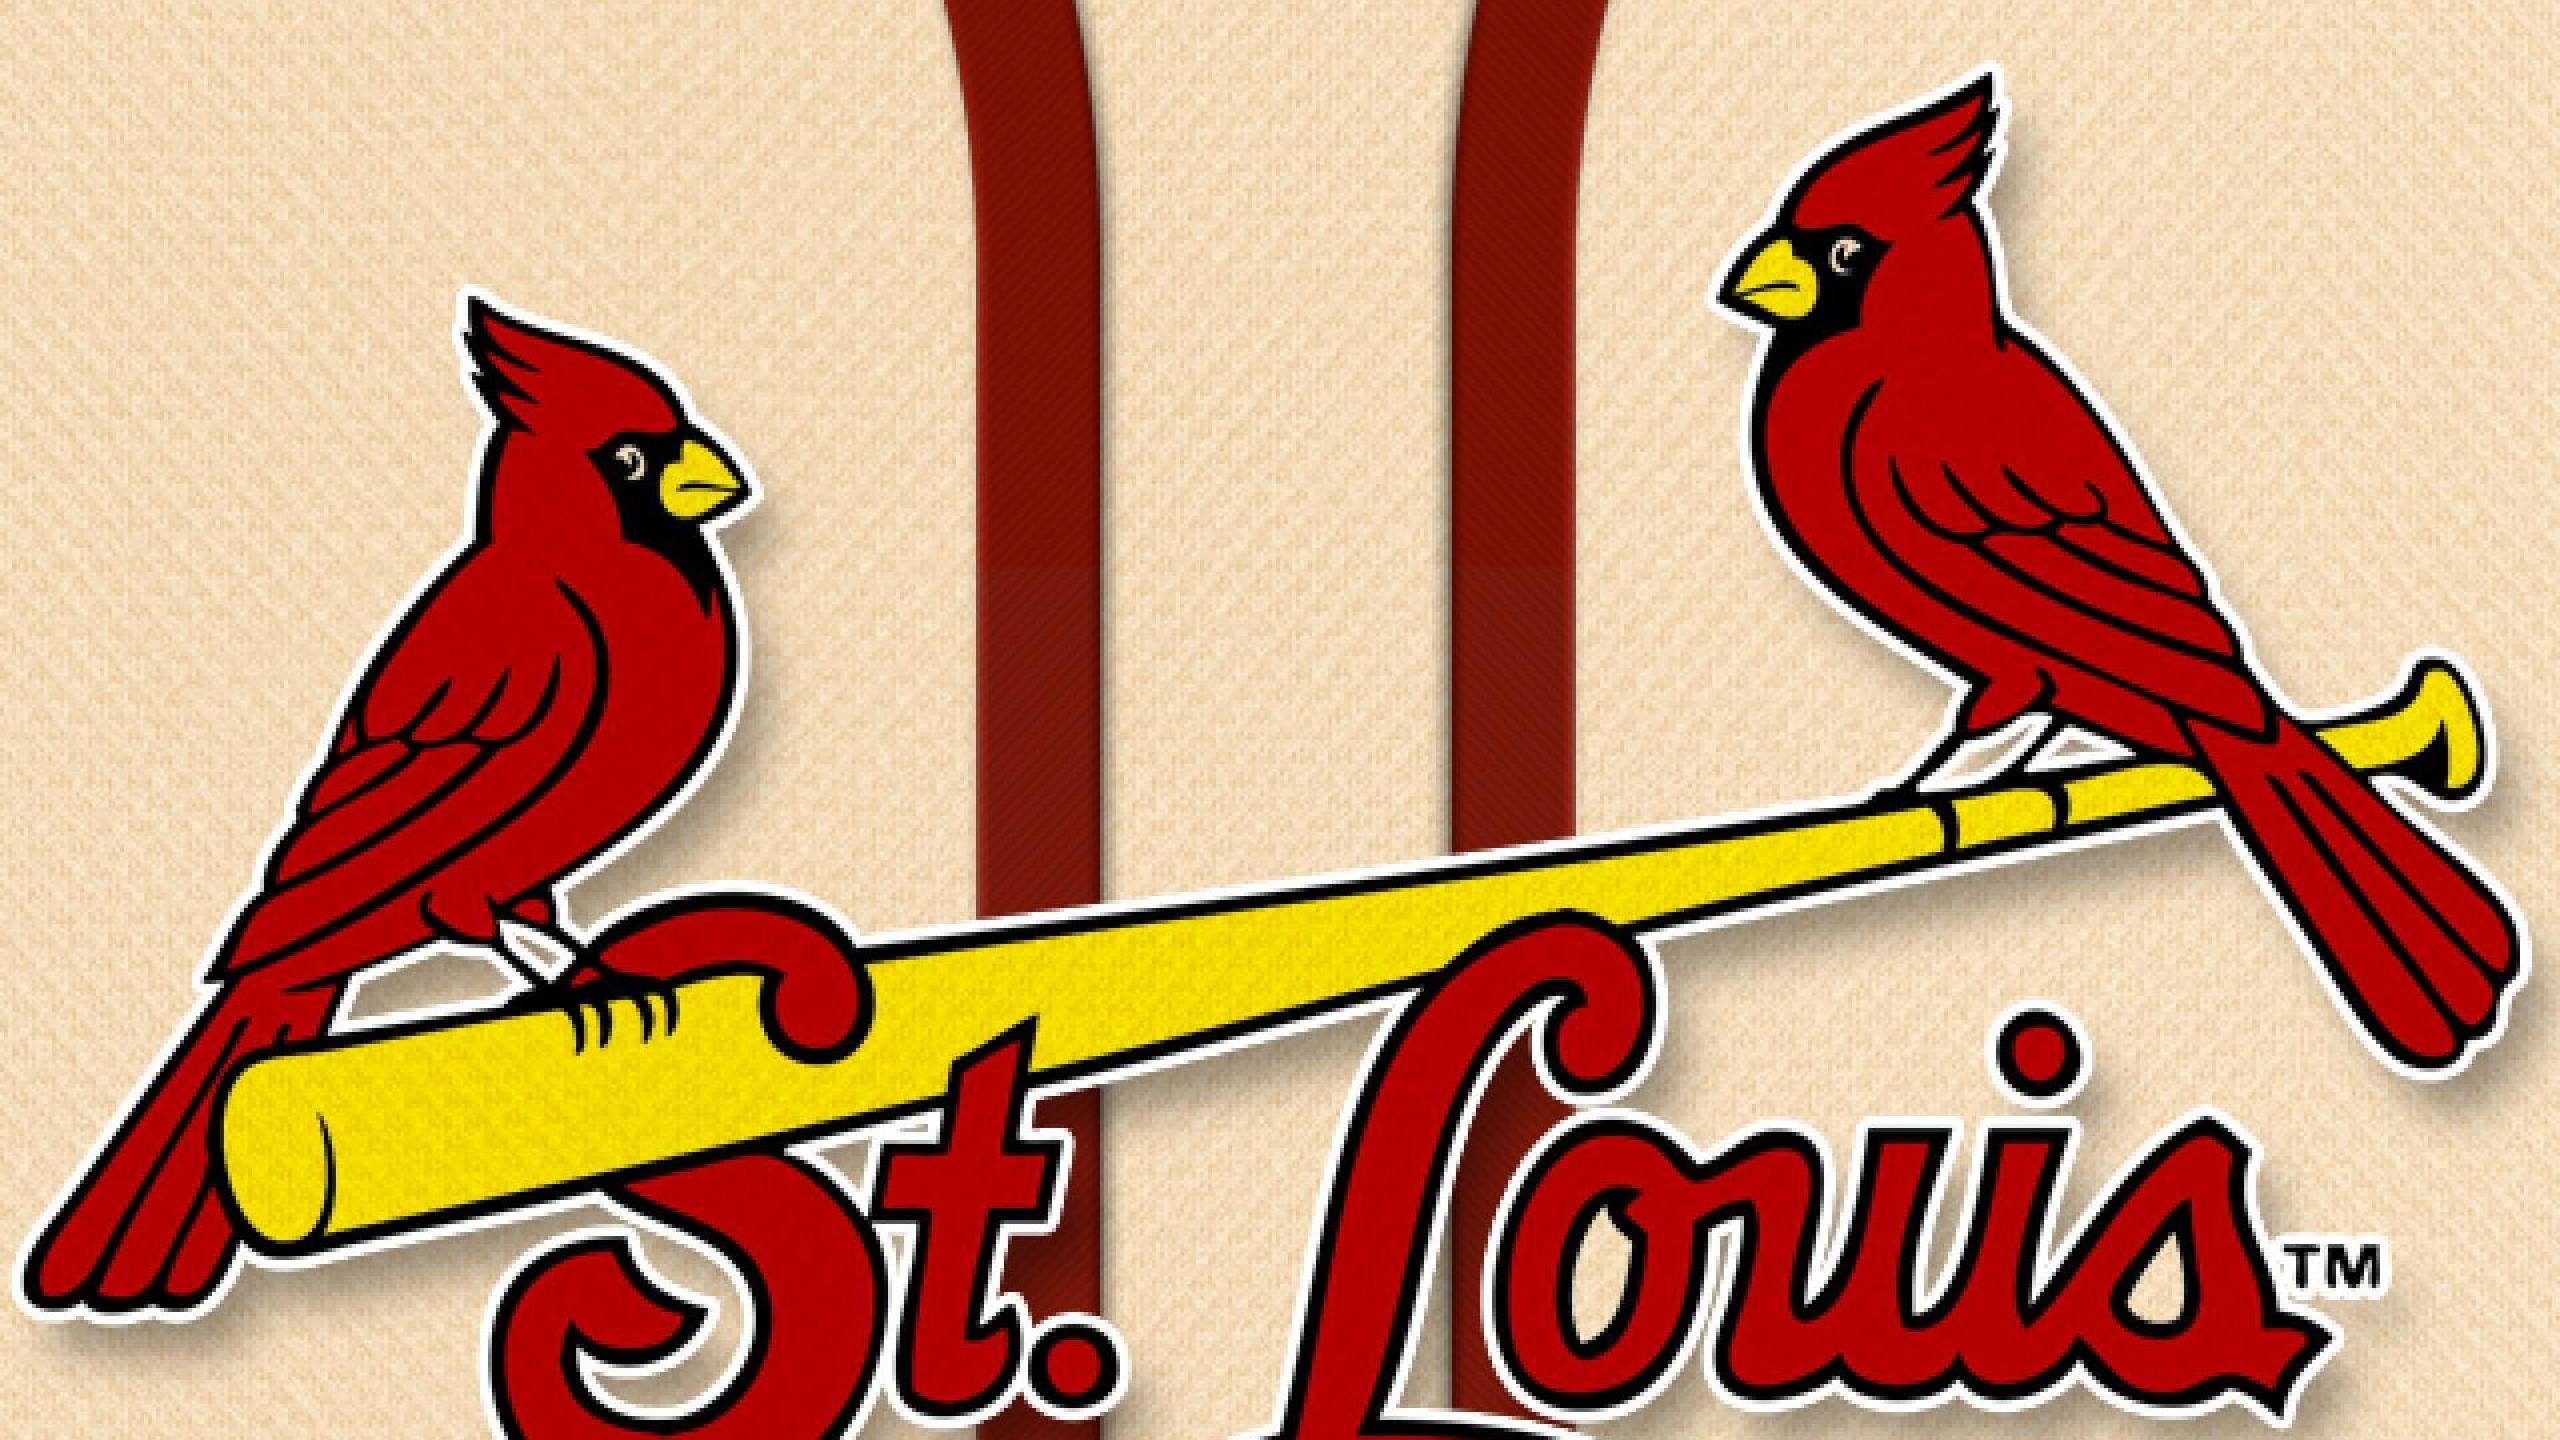 2560x1440 St Louis Cardinals Cardinals Baseball 1440p Resolution